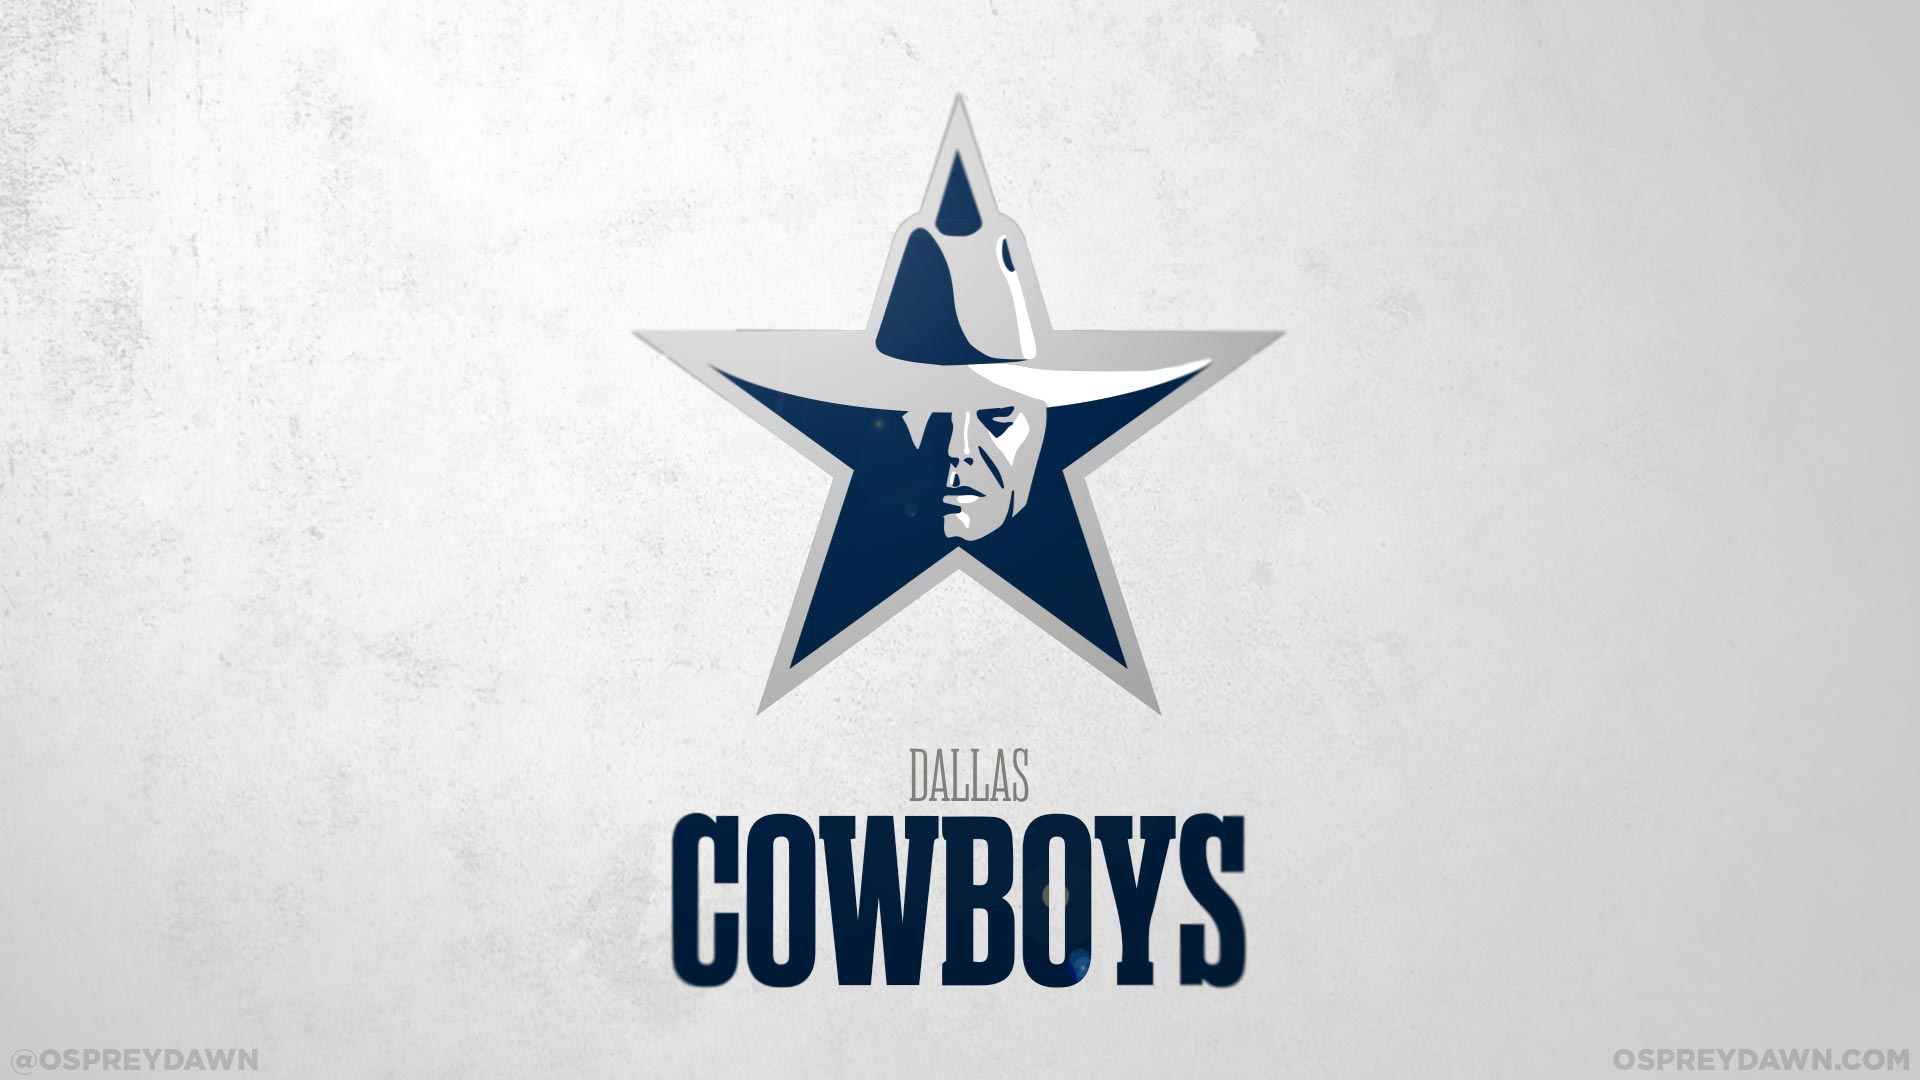 Dallas Cowboys Logo Concept - HD Wallpaper